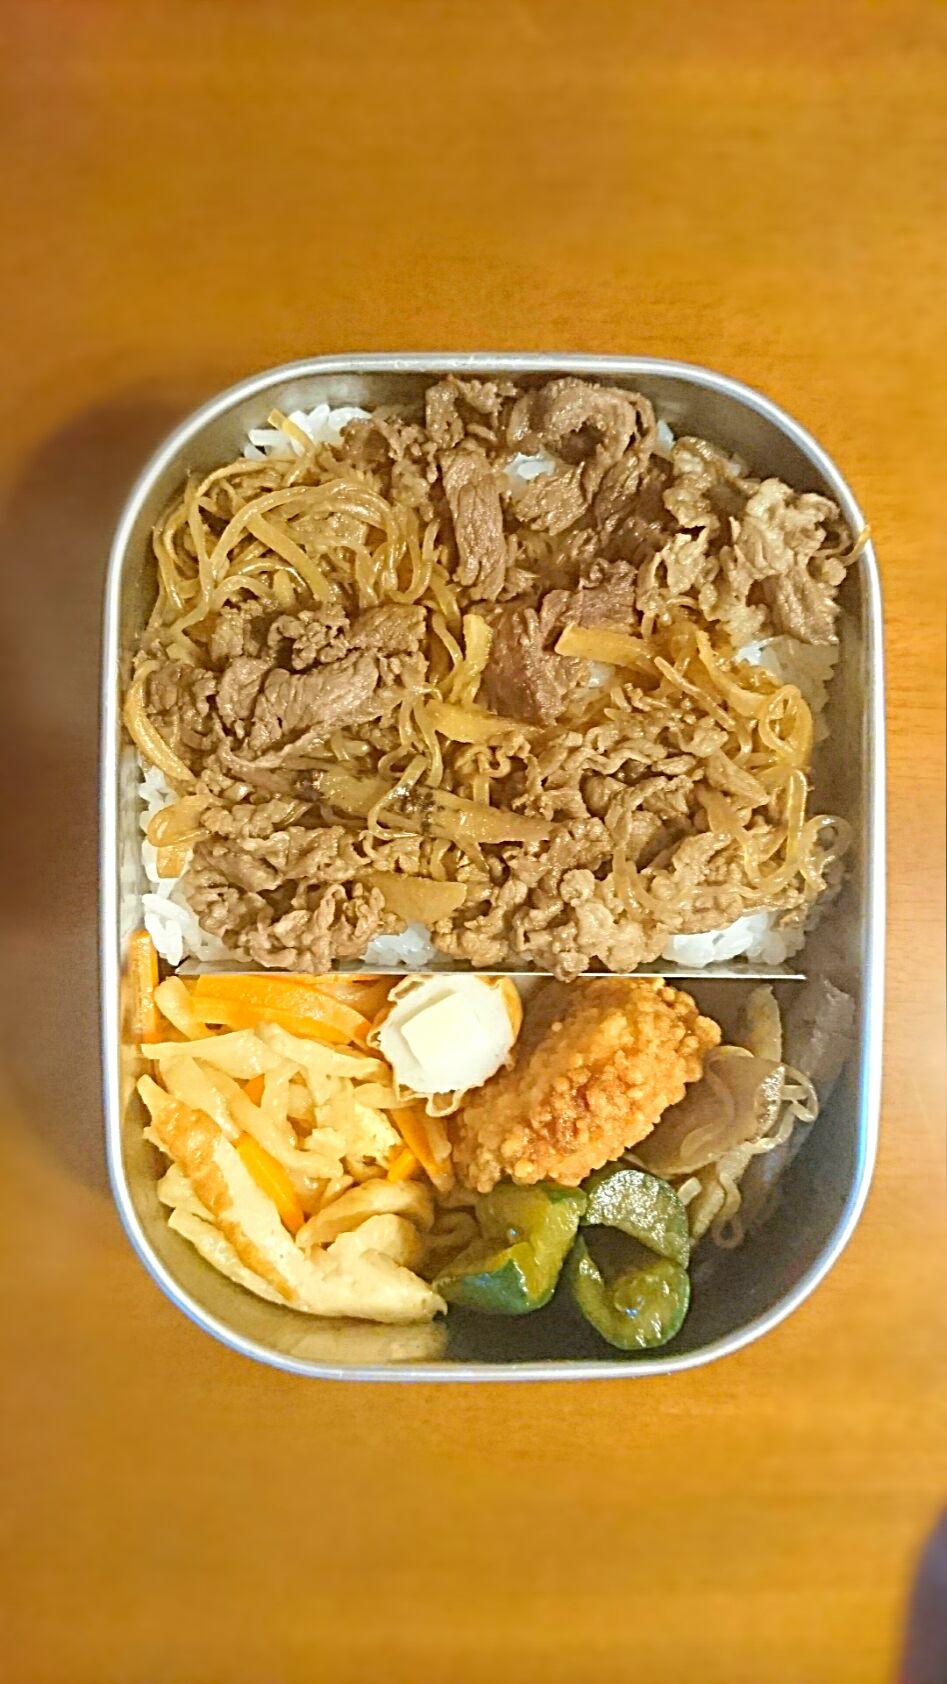 #牛丼弁当 #ご飯大盛